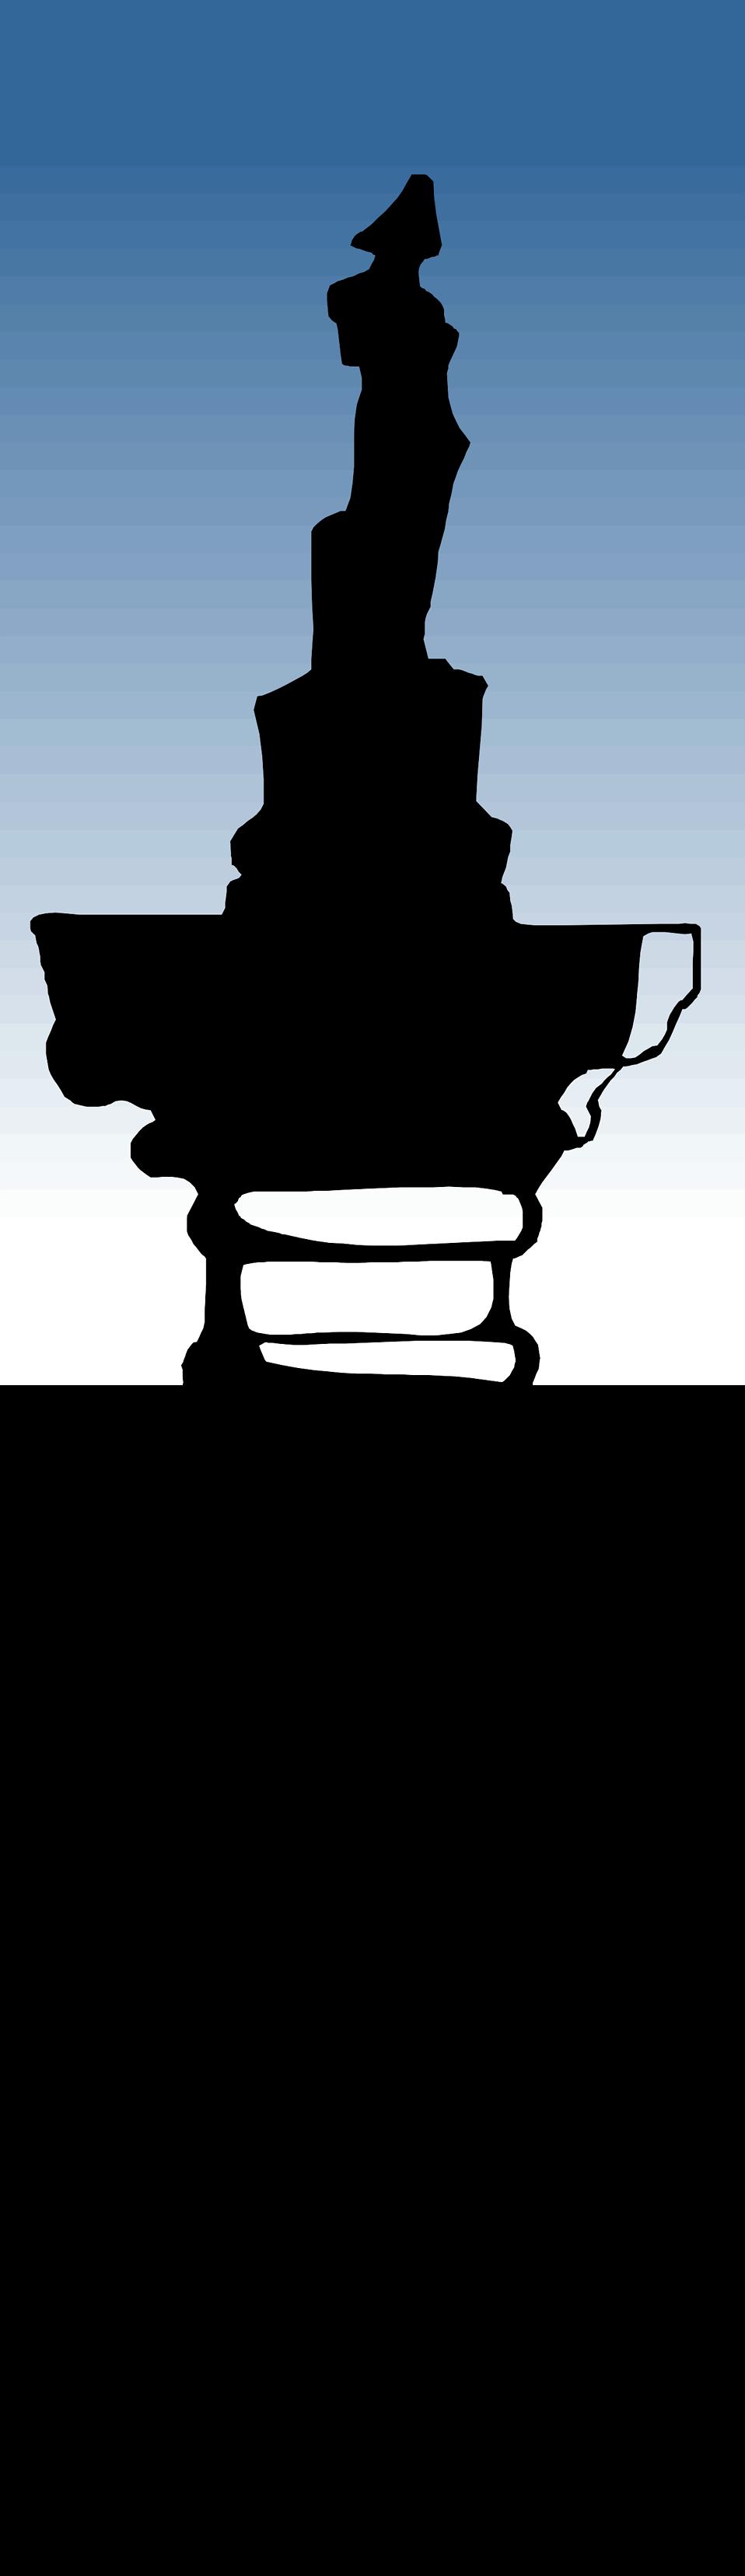 Column clipart free vector. Nelsons stock photo illustration